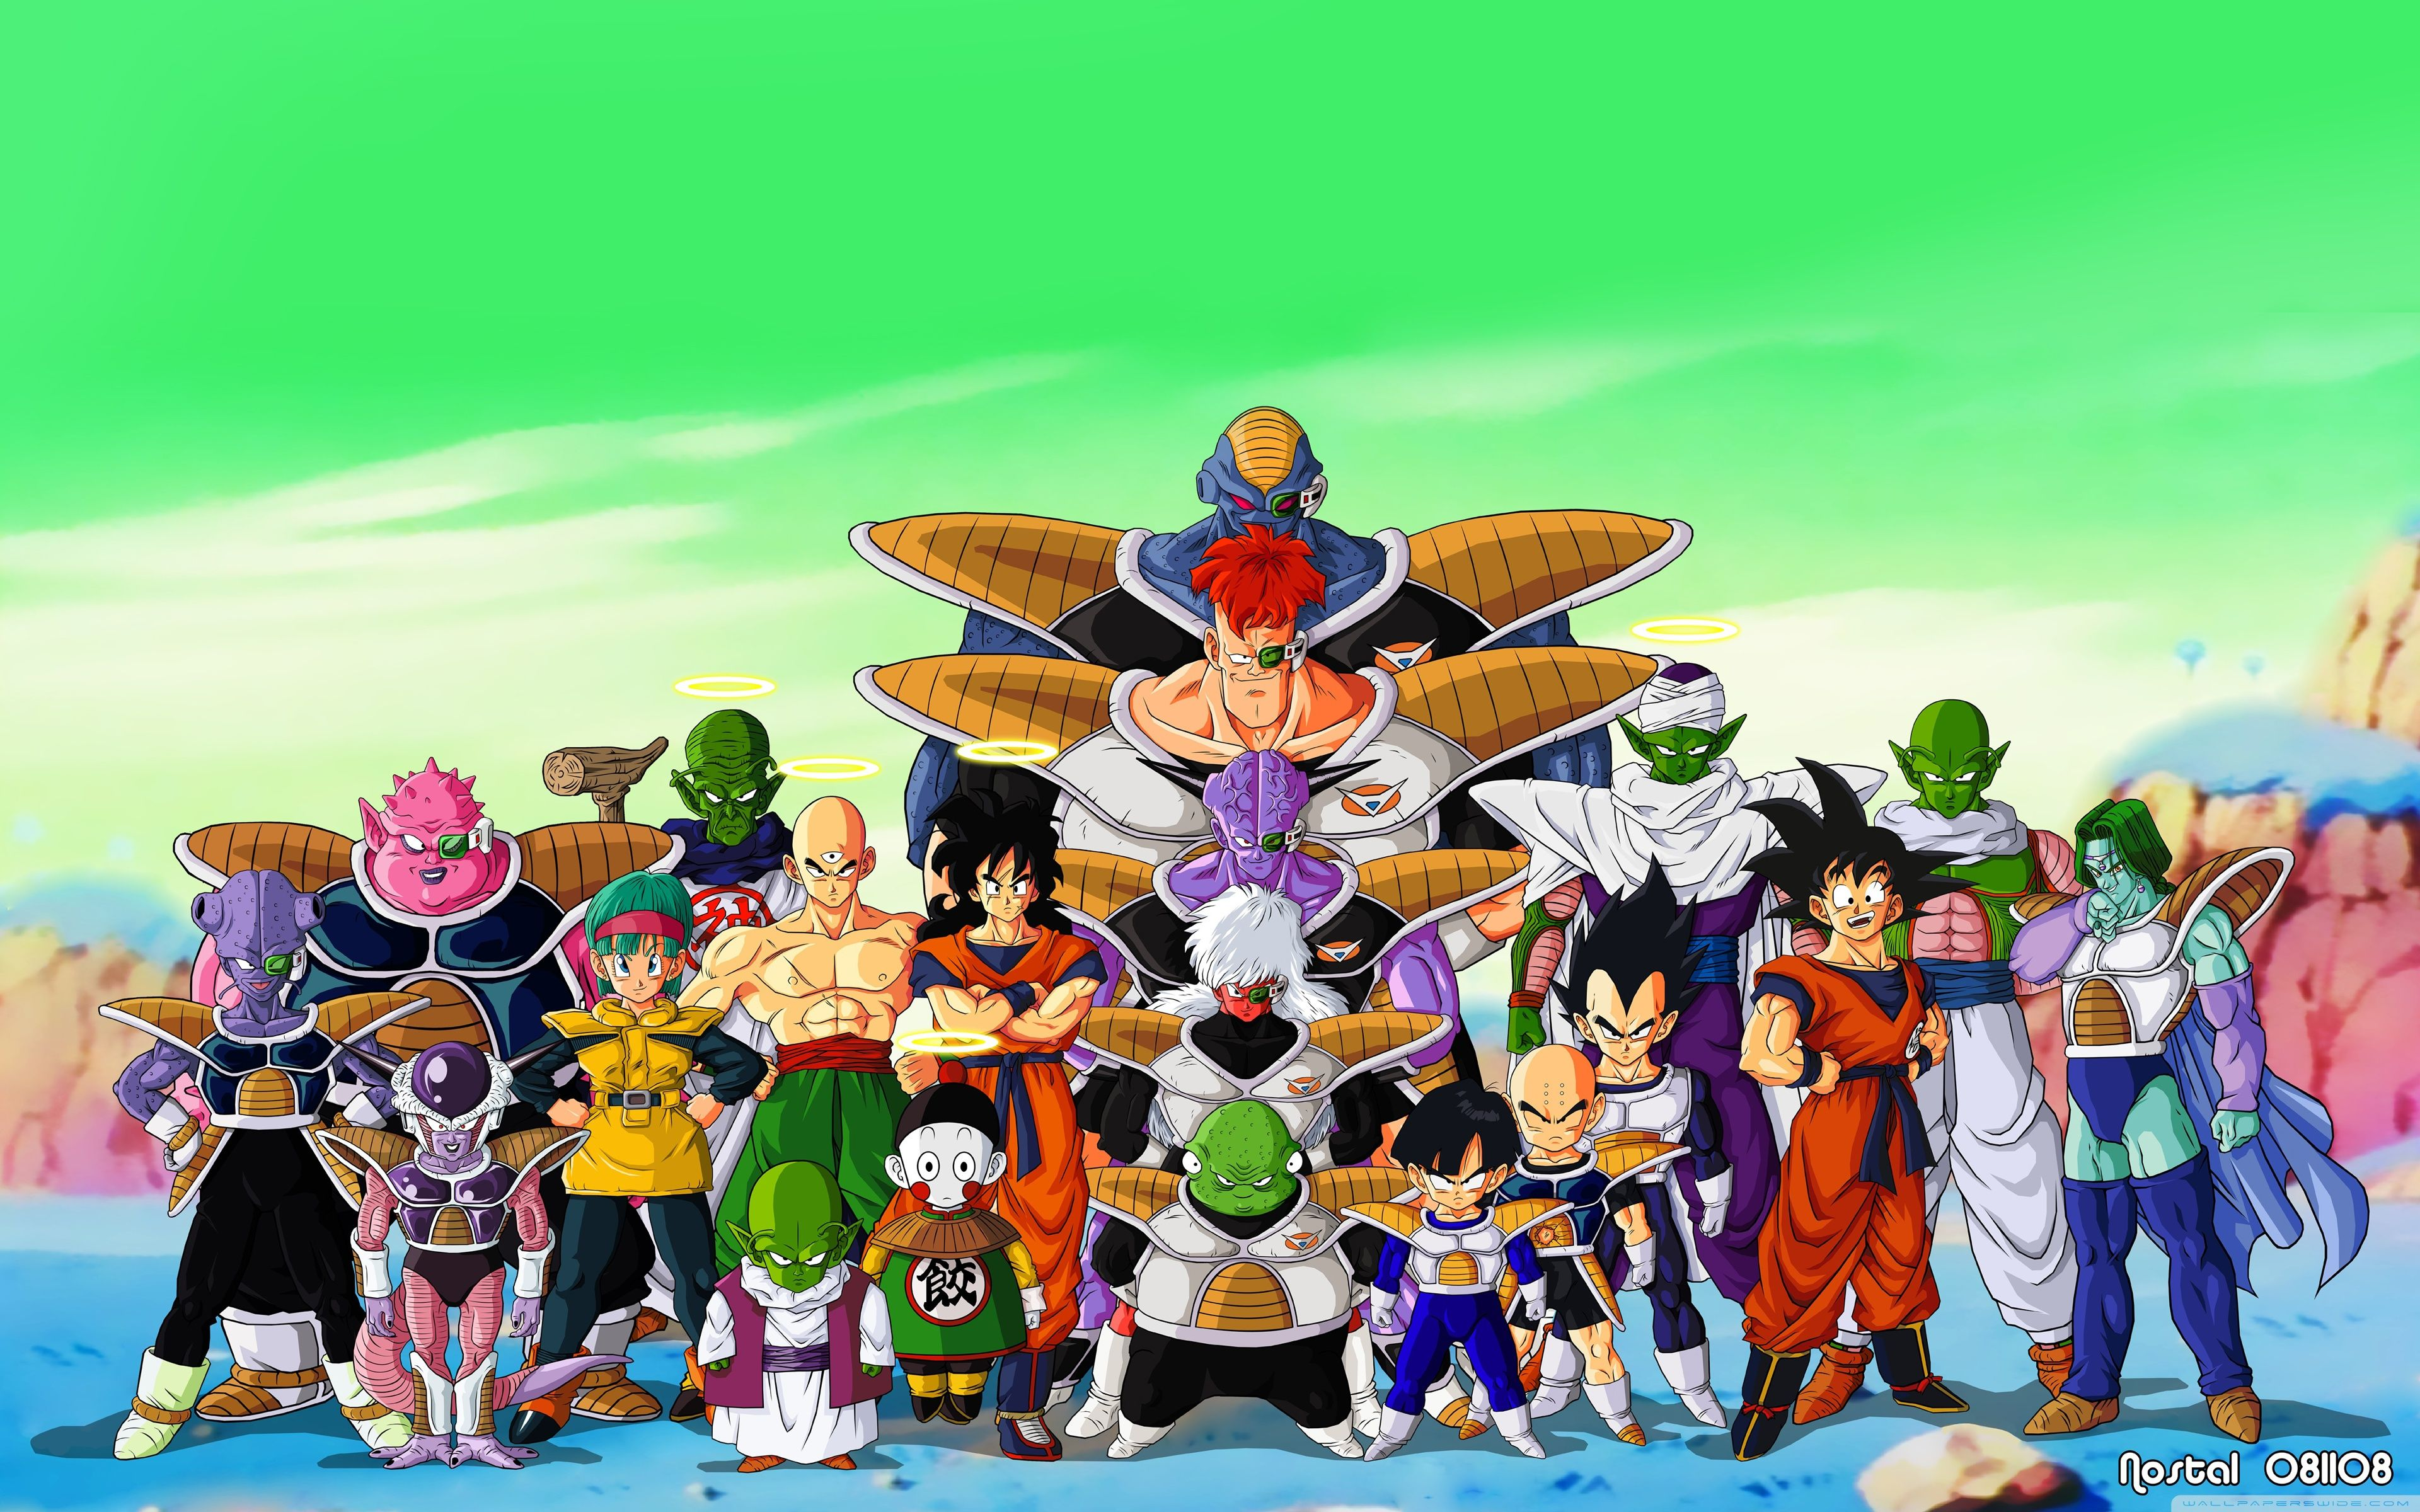 Dragon Ball Z Wallpapers Top Free Dragon Ball Z Backgrounds